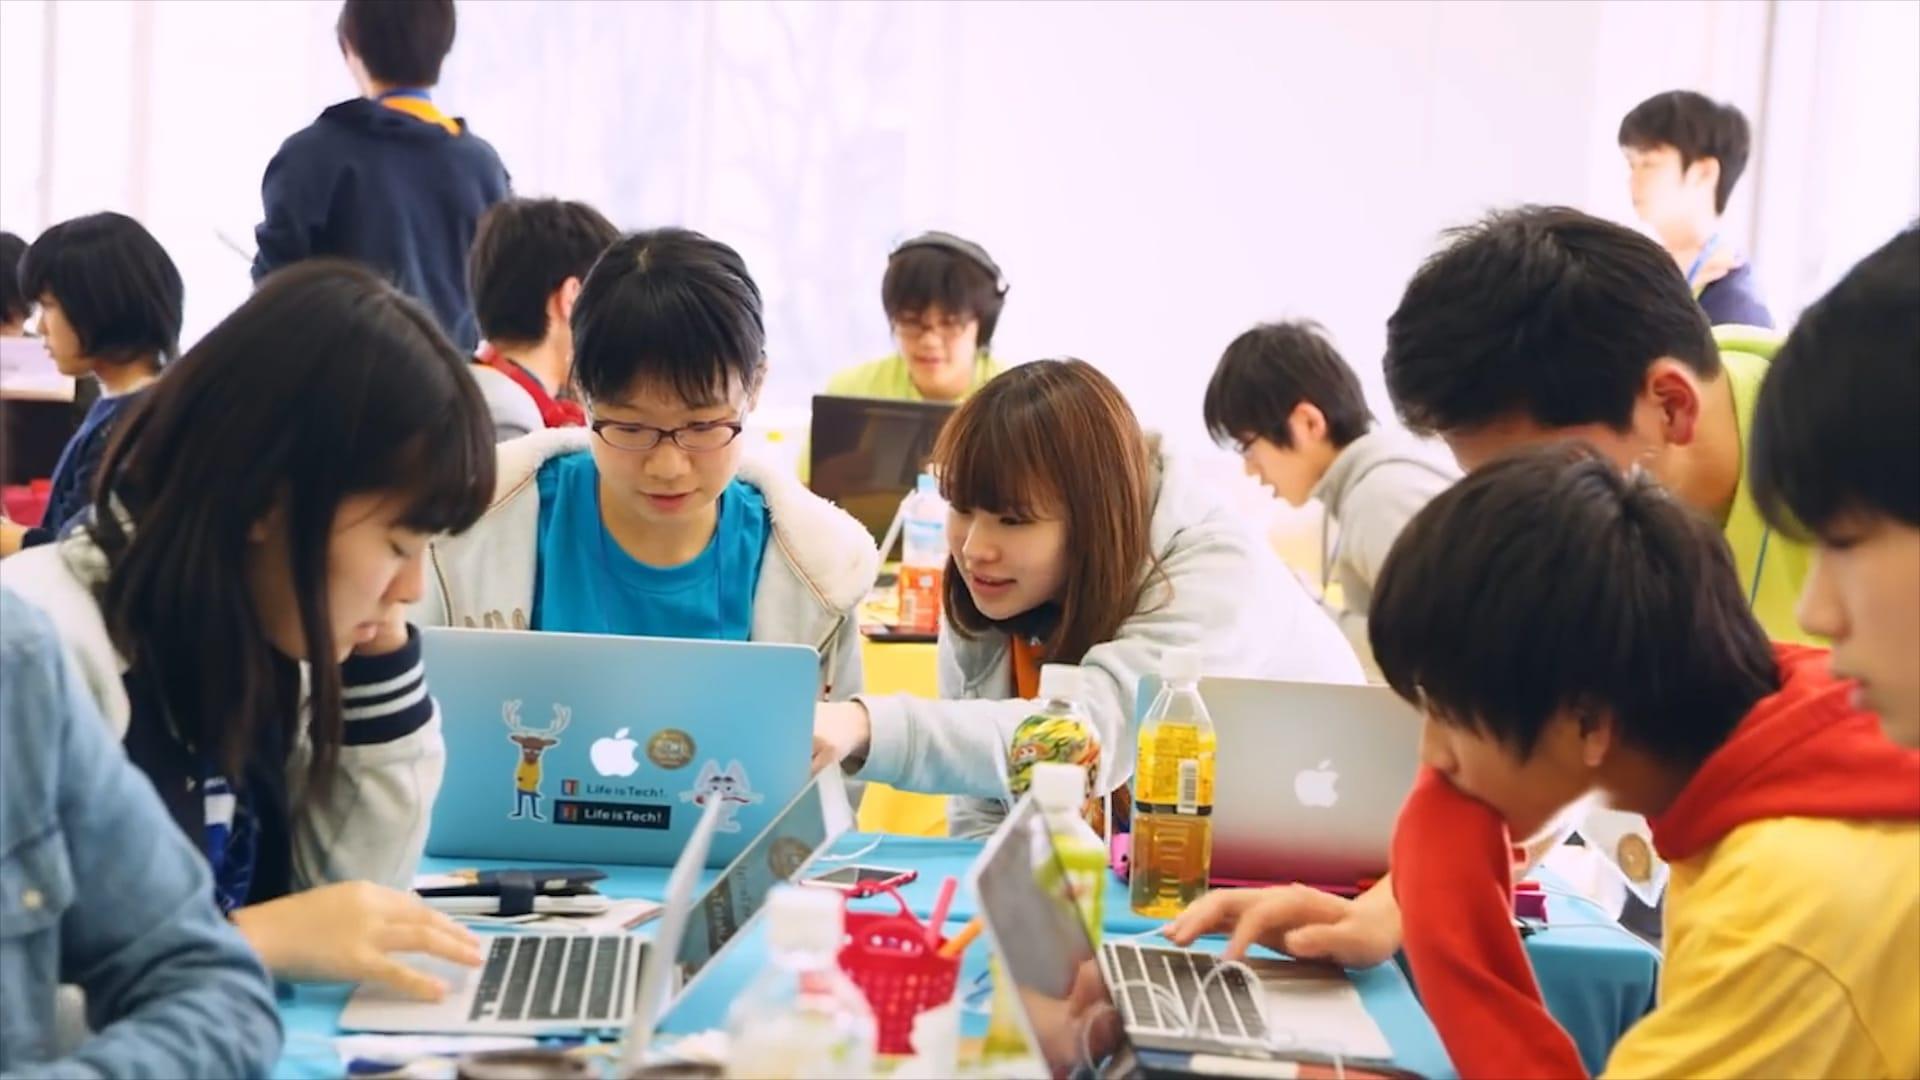 【 Life is Tech ! 】中高生向けプログラミング・ITキャンプ2016夏募集MOVIE